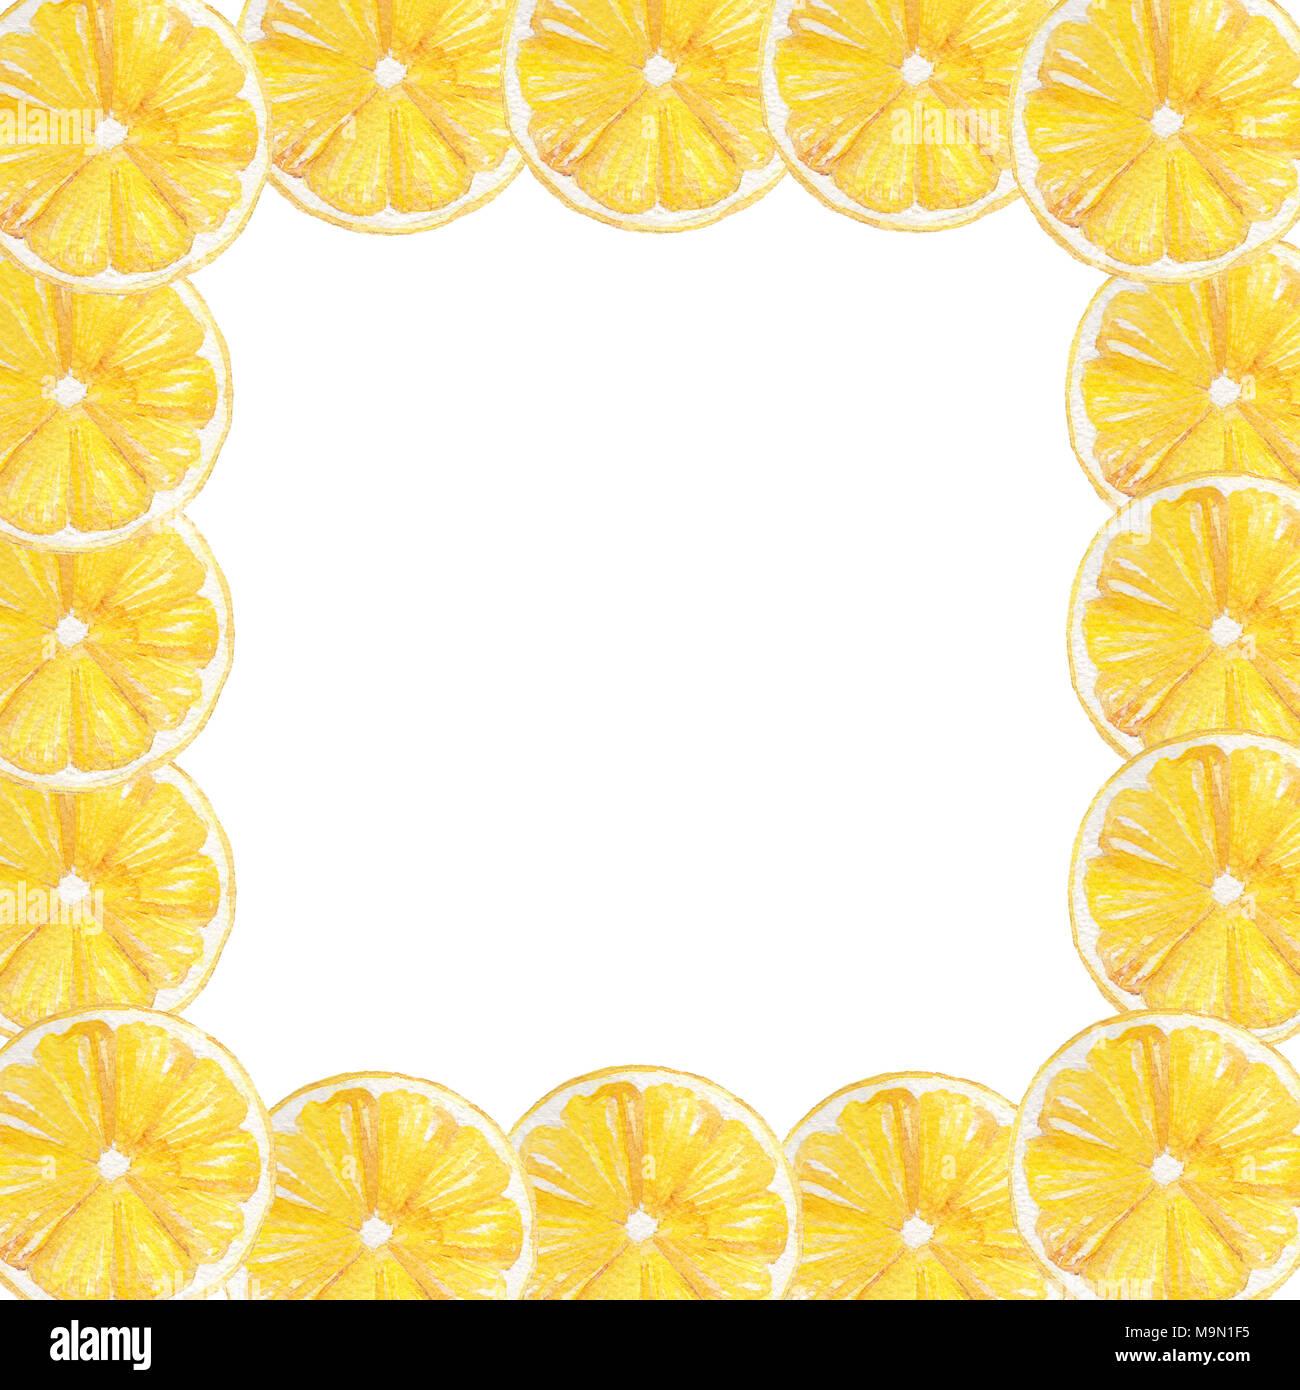 watercolor hand drawn lemon yellow fruit frame border perfect for